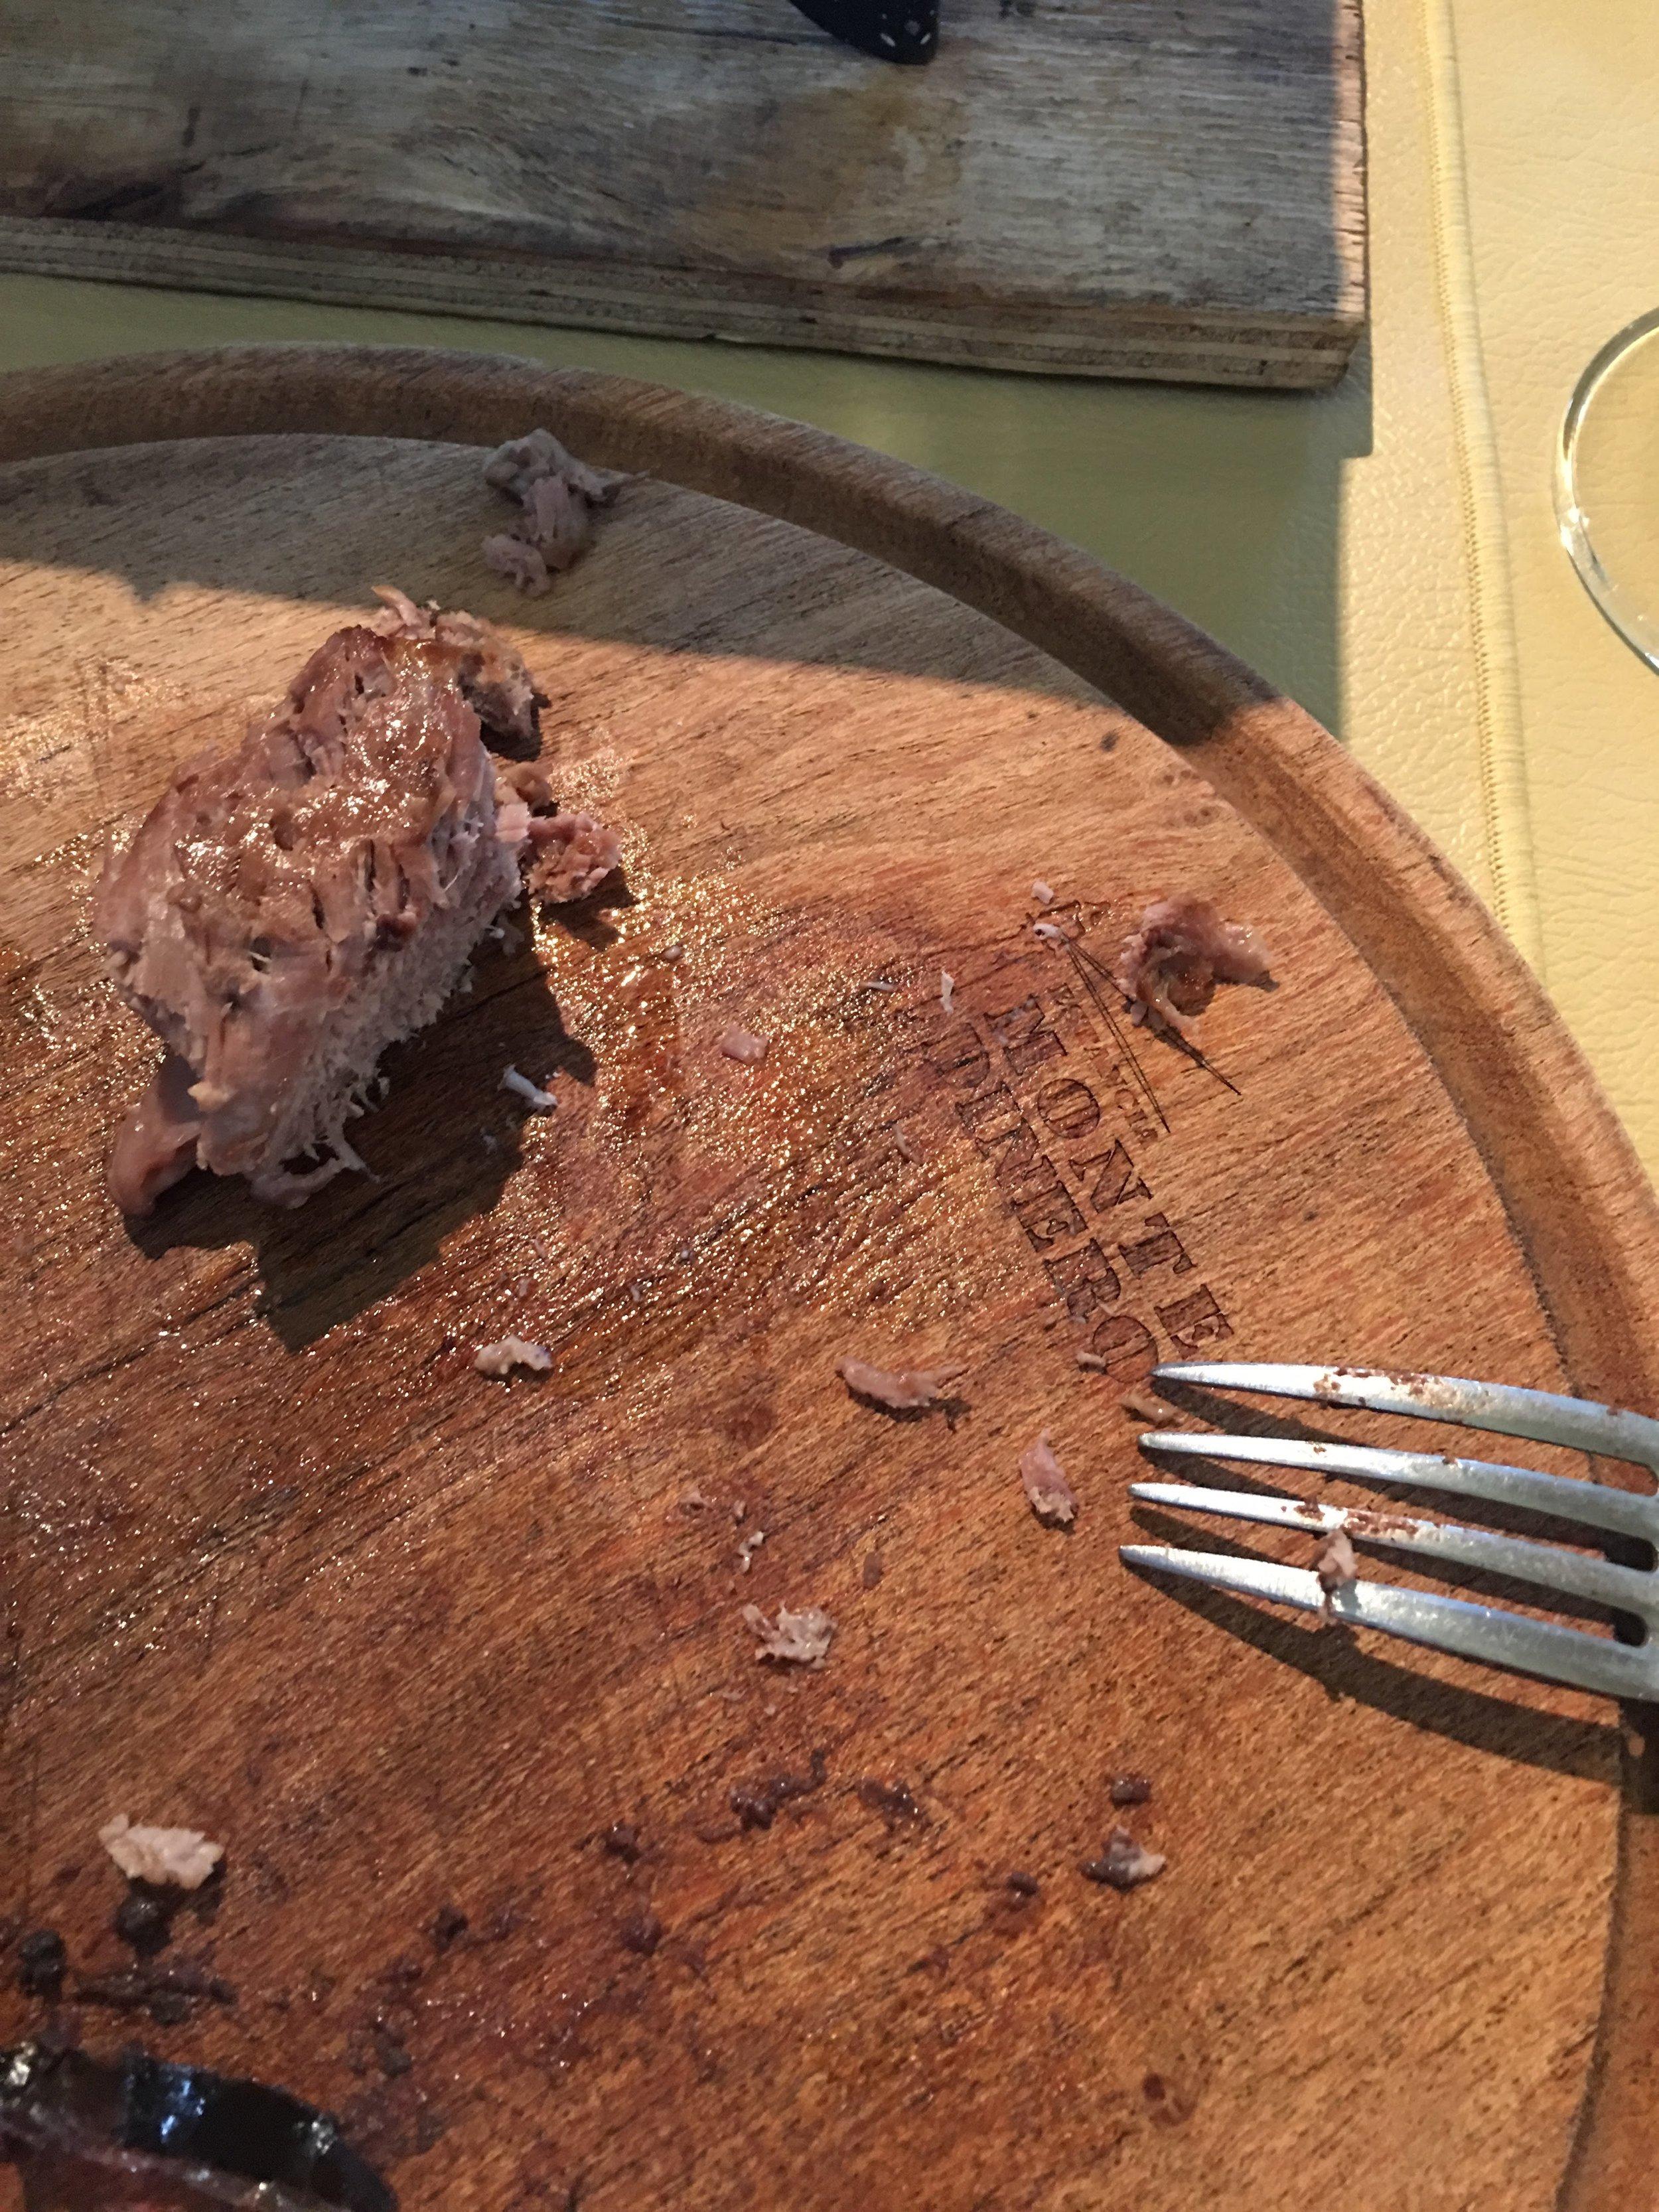 tabla madera patagonia cordero.jpg